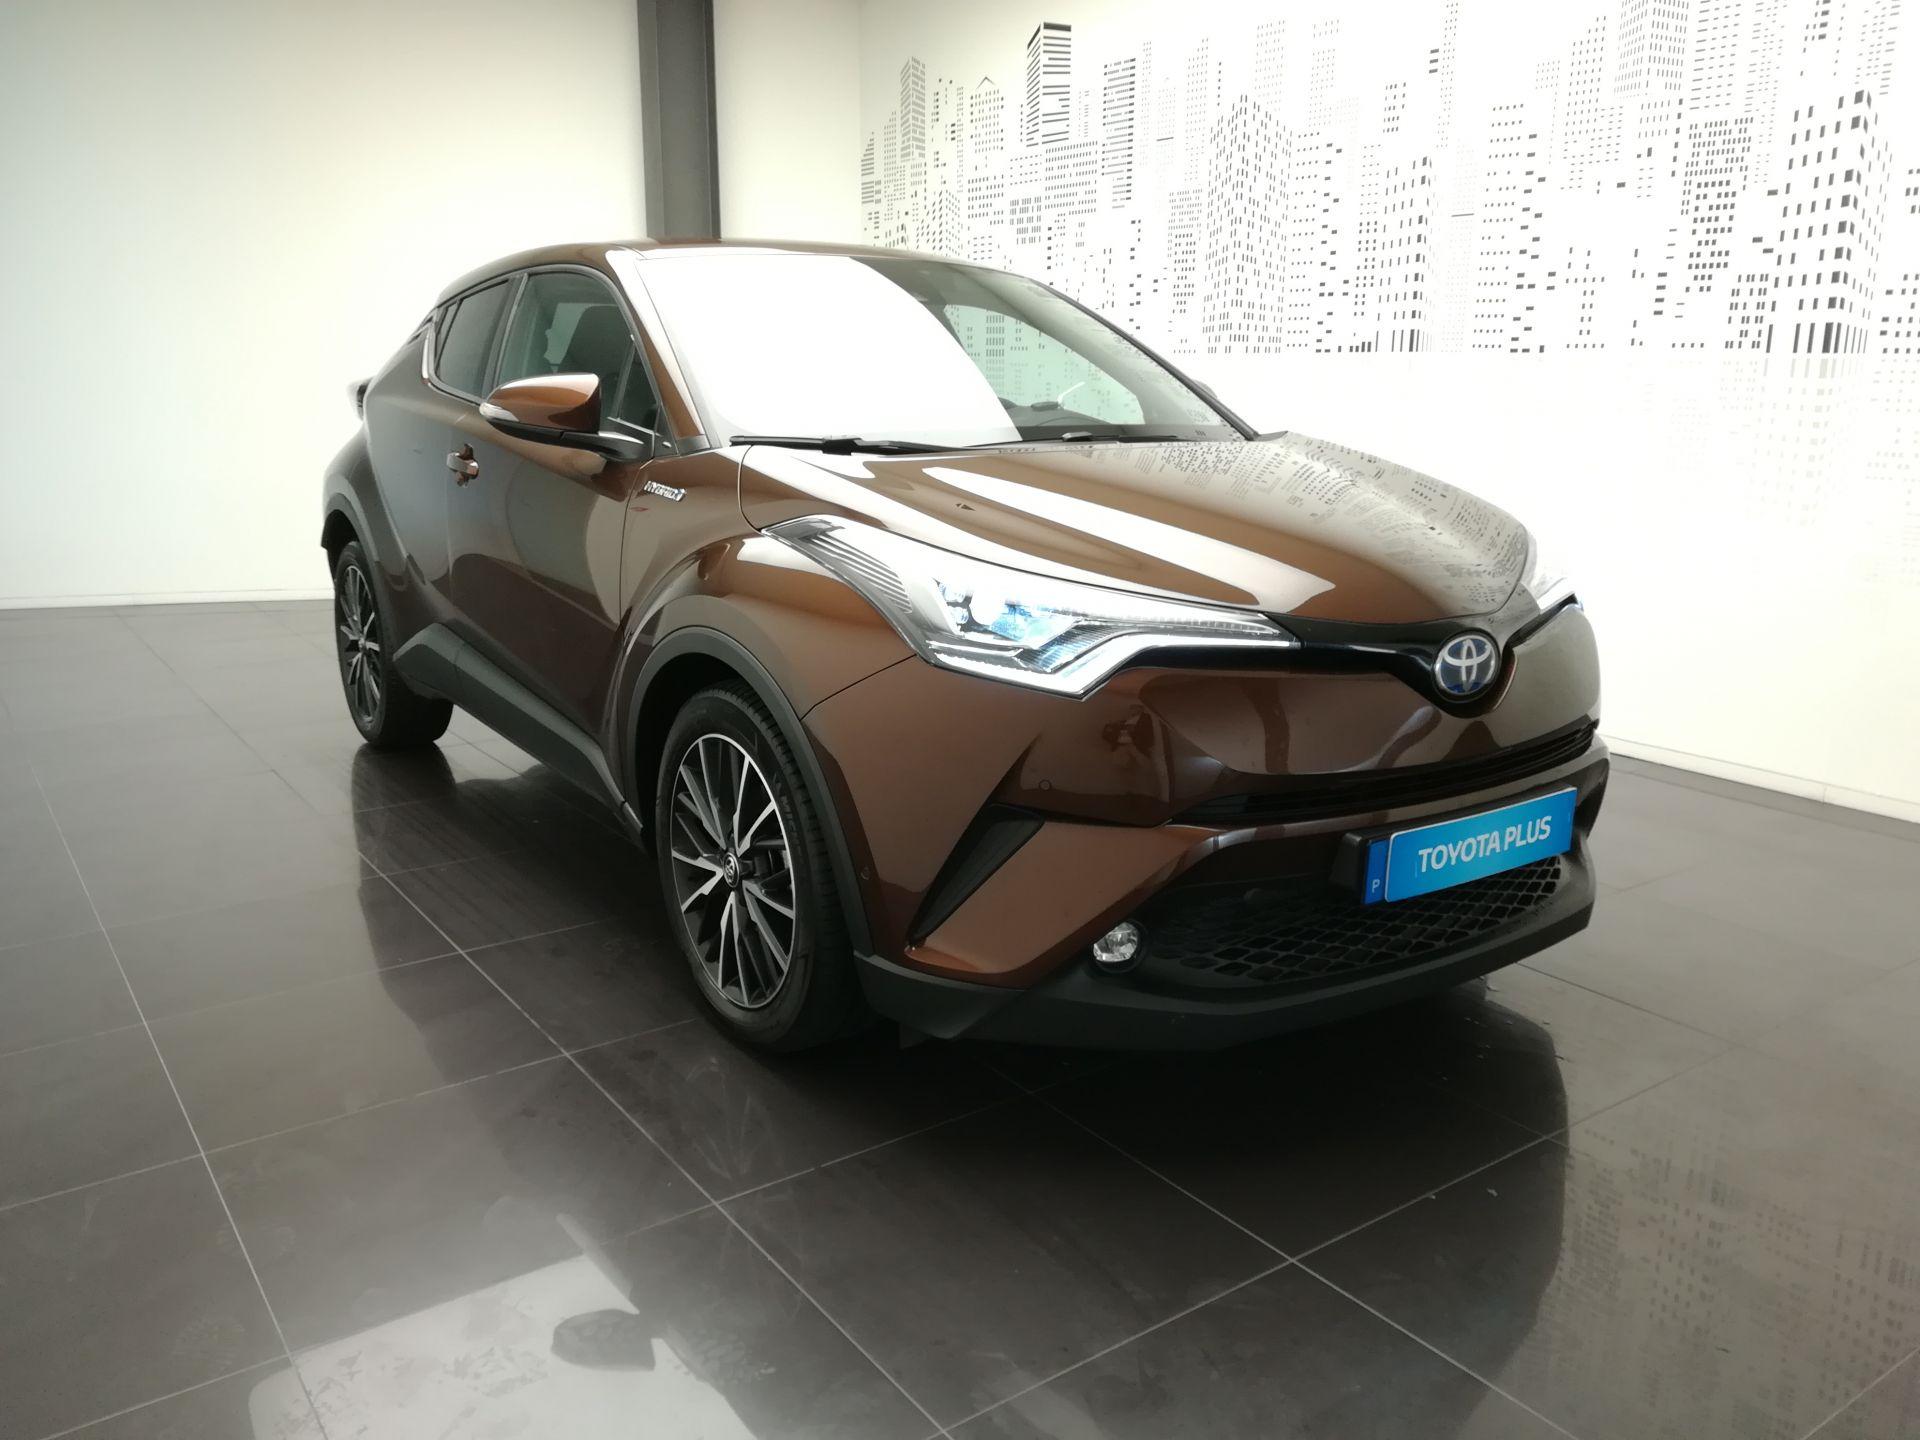 Toyota C-HR 1.8 HSD Exclusive + Pack Luxury segunda mão Aveiro